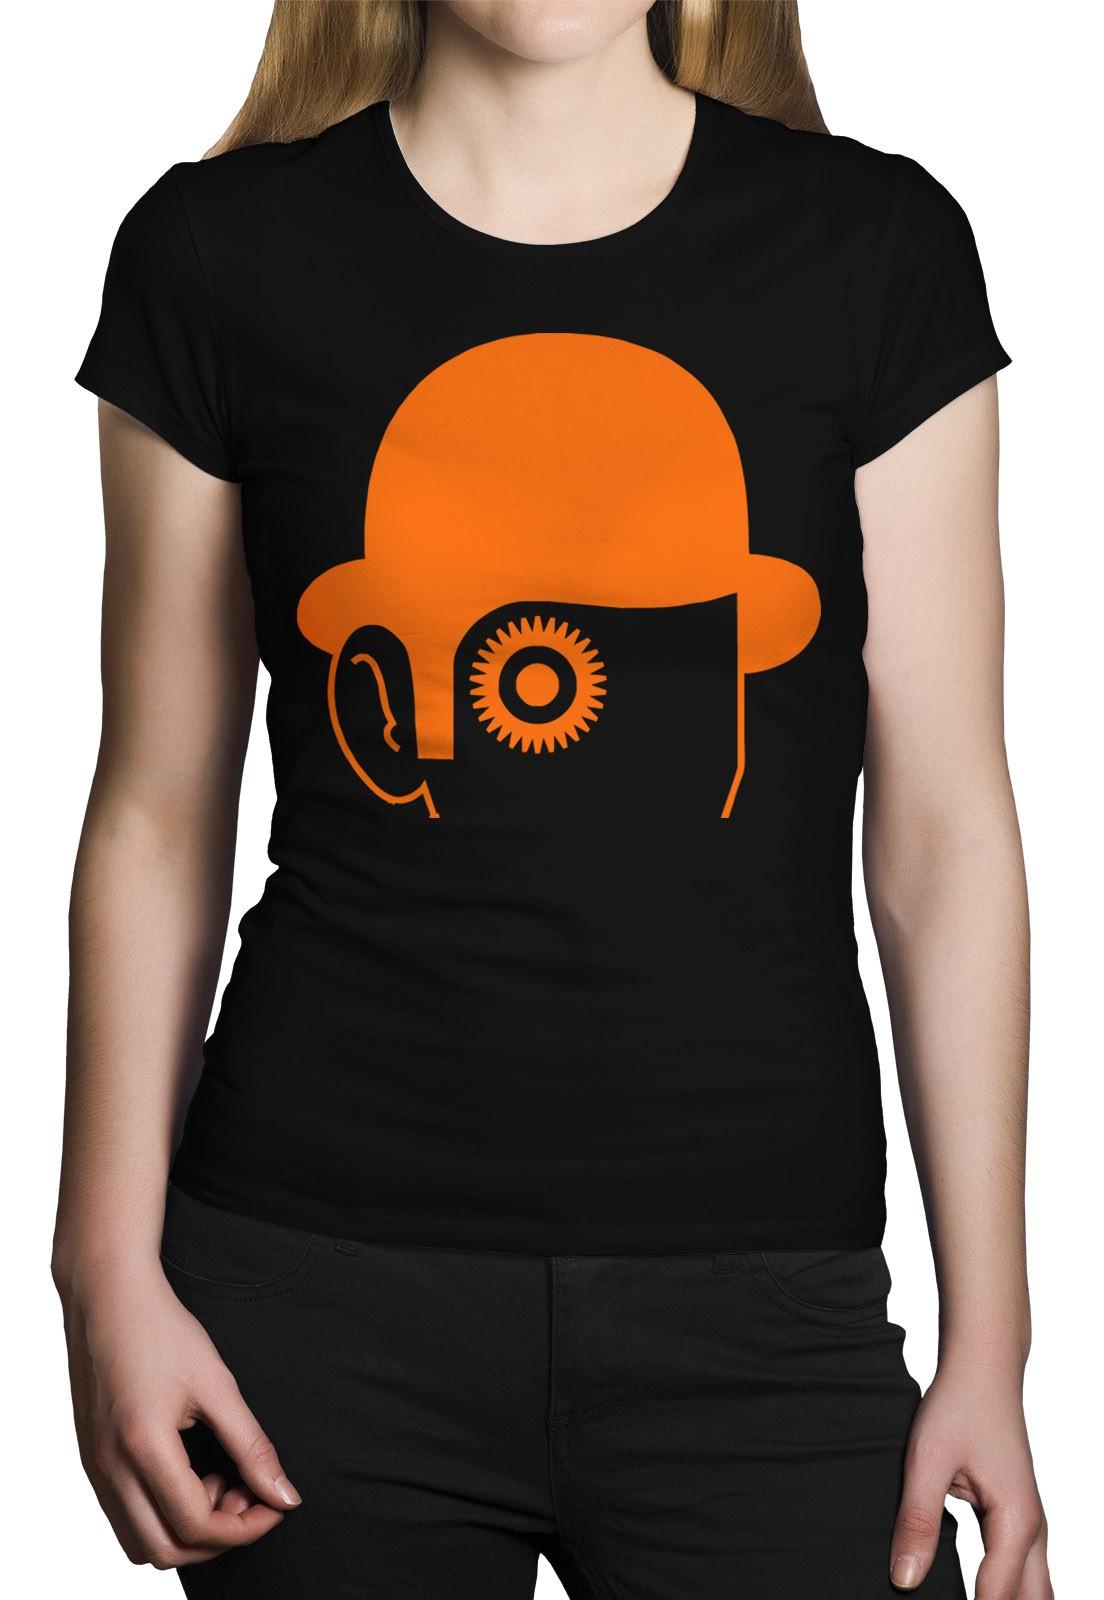 Camiseta HShop Laranja Mecânica Preto  - HShop